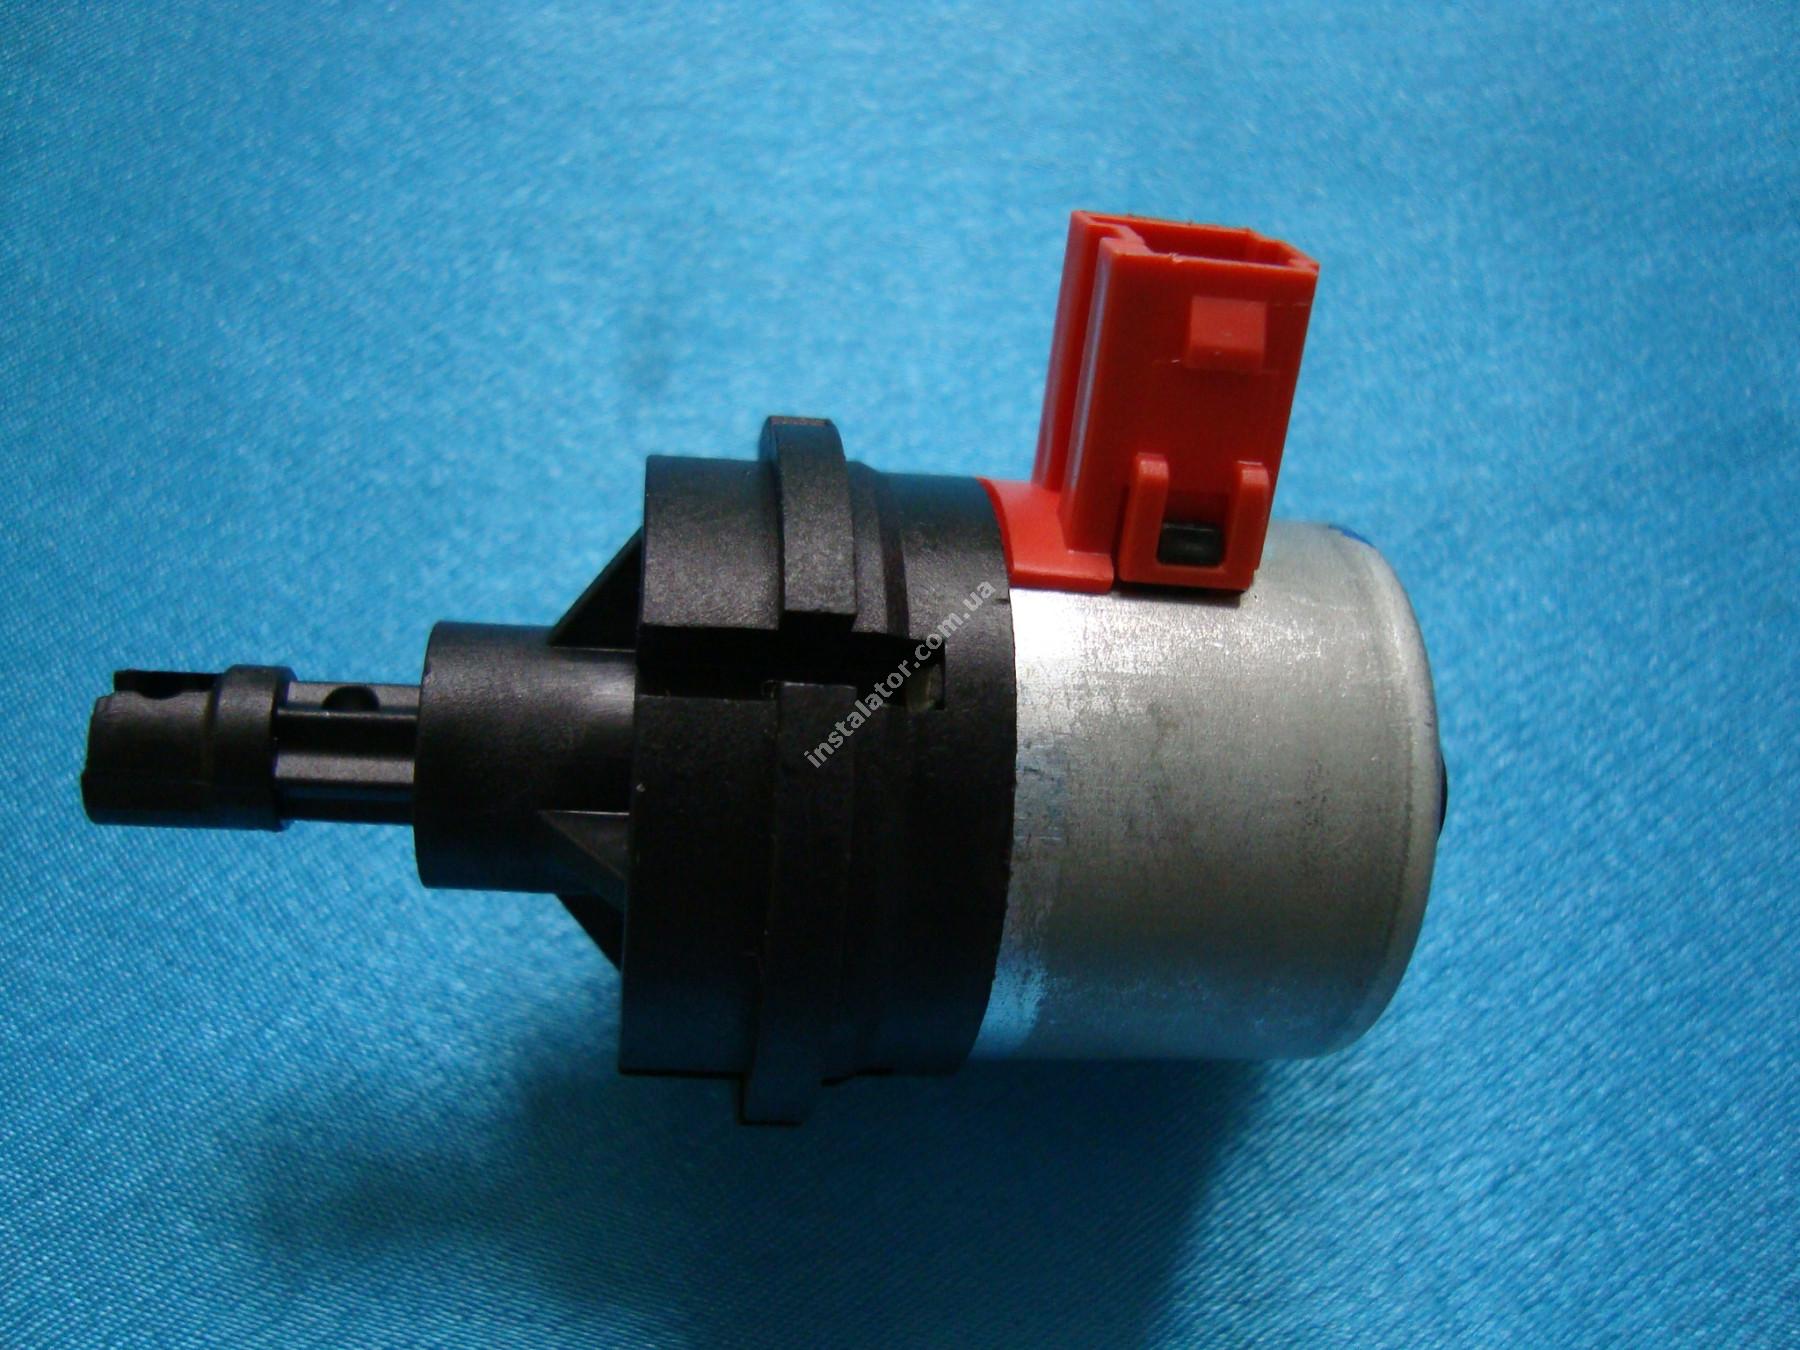 S1053700 Привід 3-х ходового клапана Saunier Duval Semia, Isofast   full-image-1